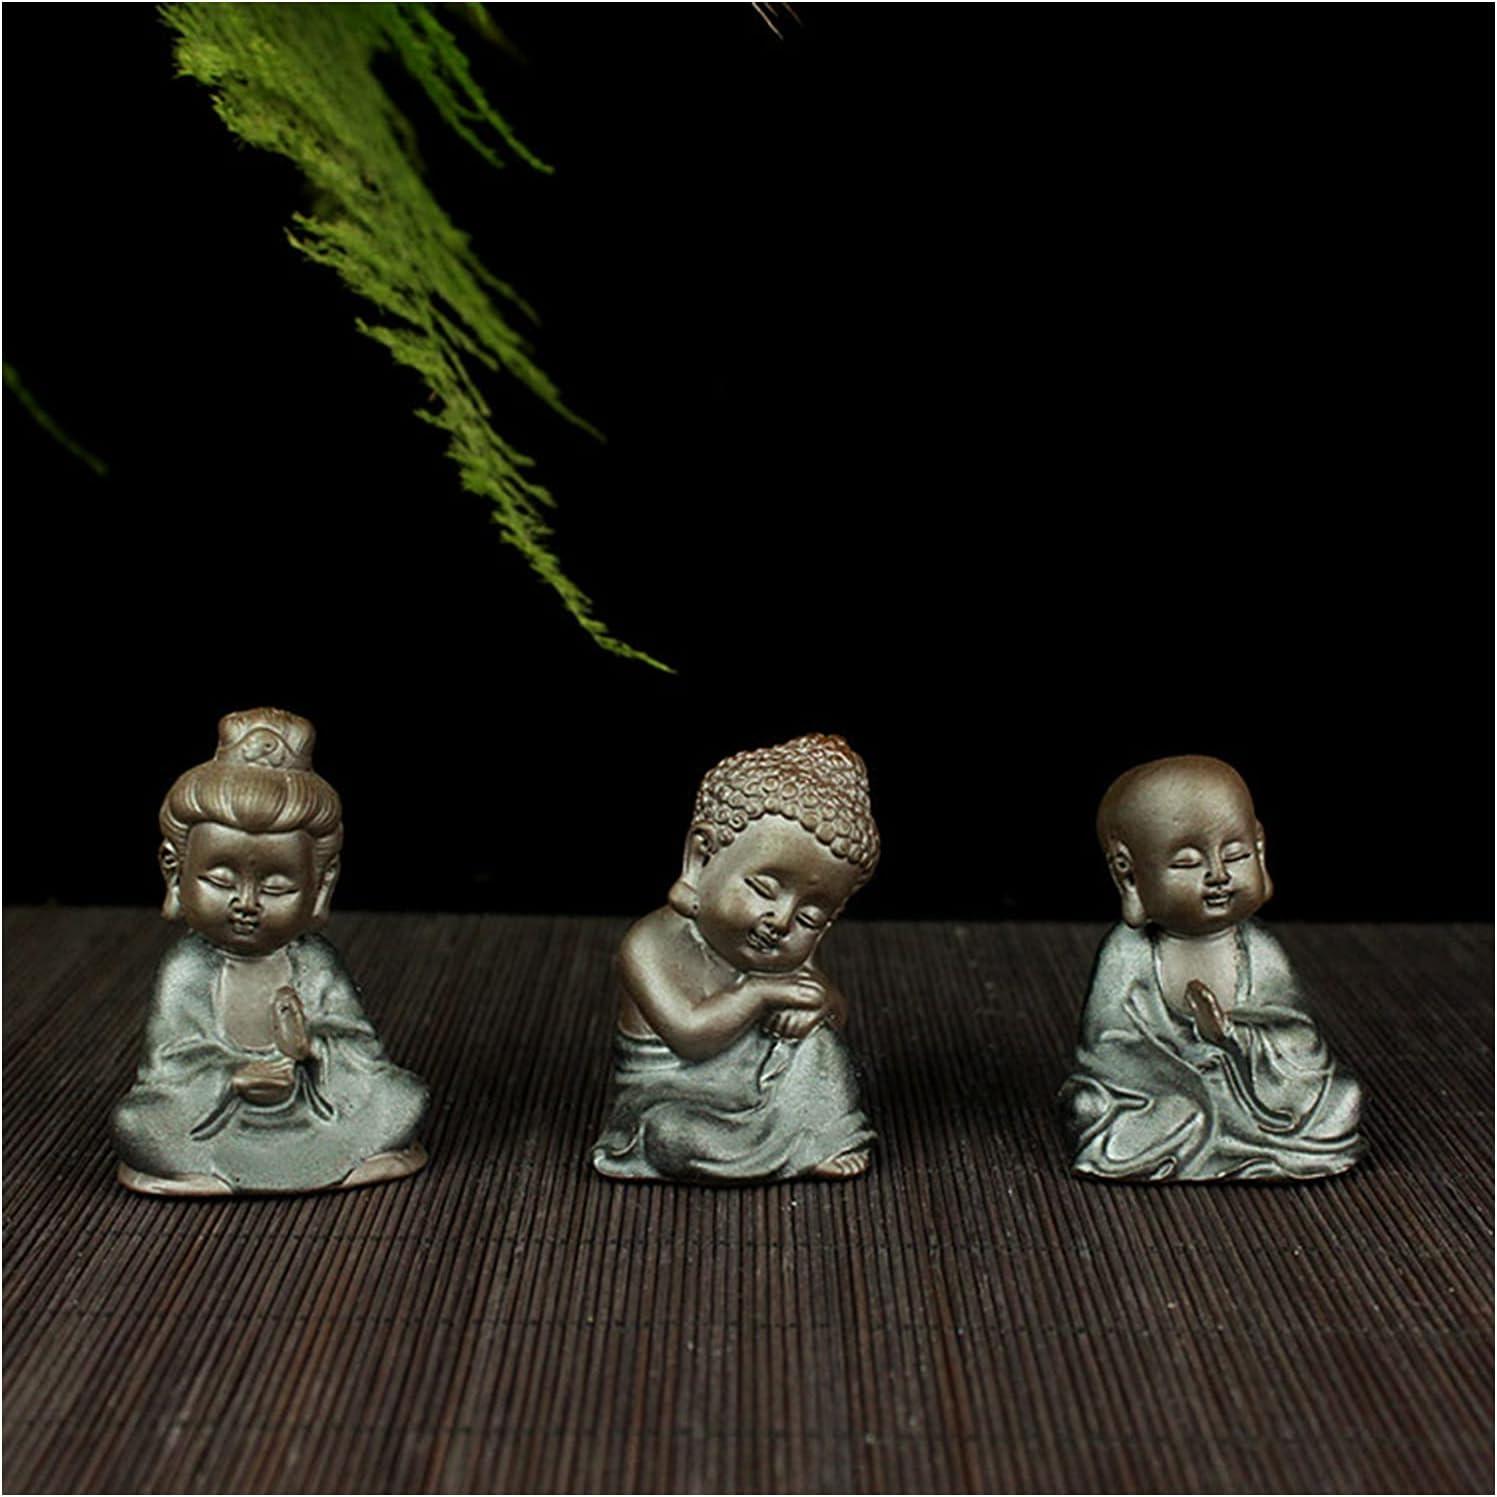 MOZHIXUE Buddah Ranking TOP9 Statute Small cheap Buddha Statue Cute X 4 Traditional